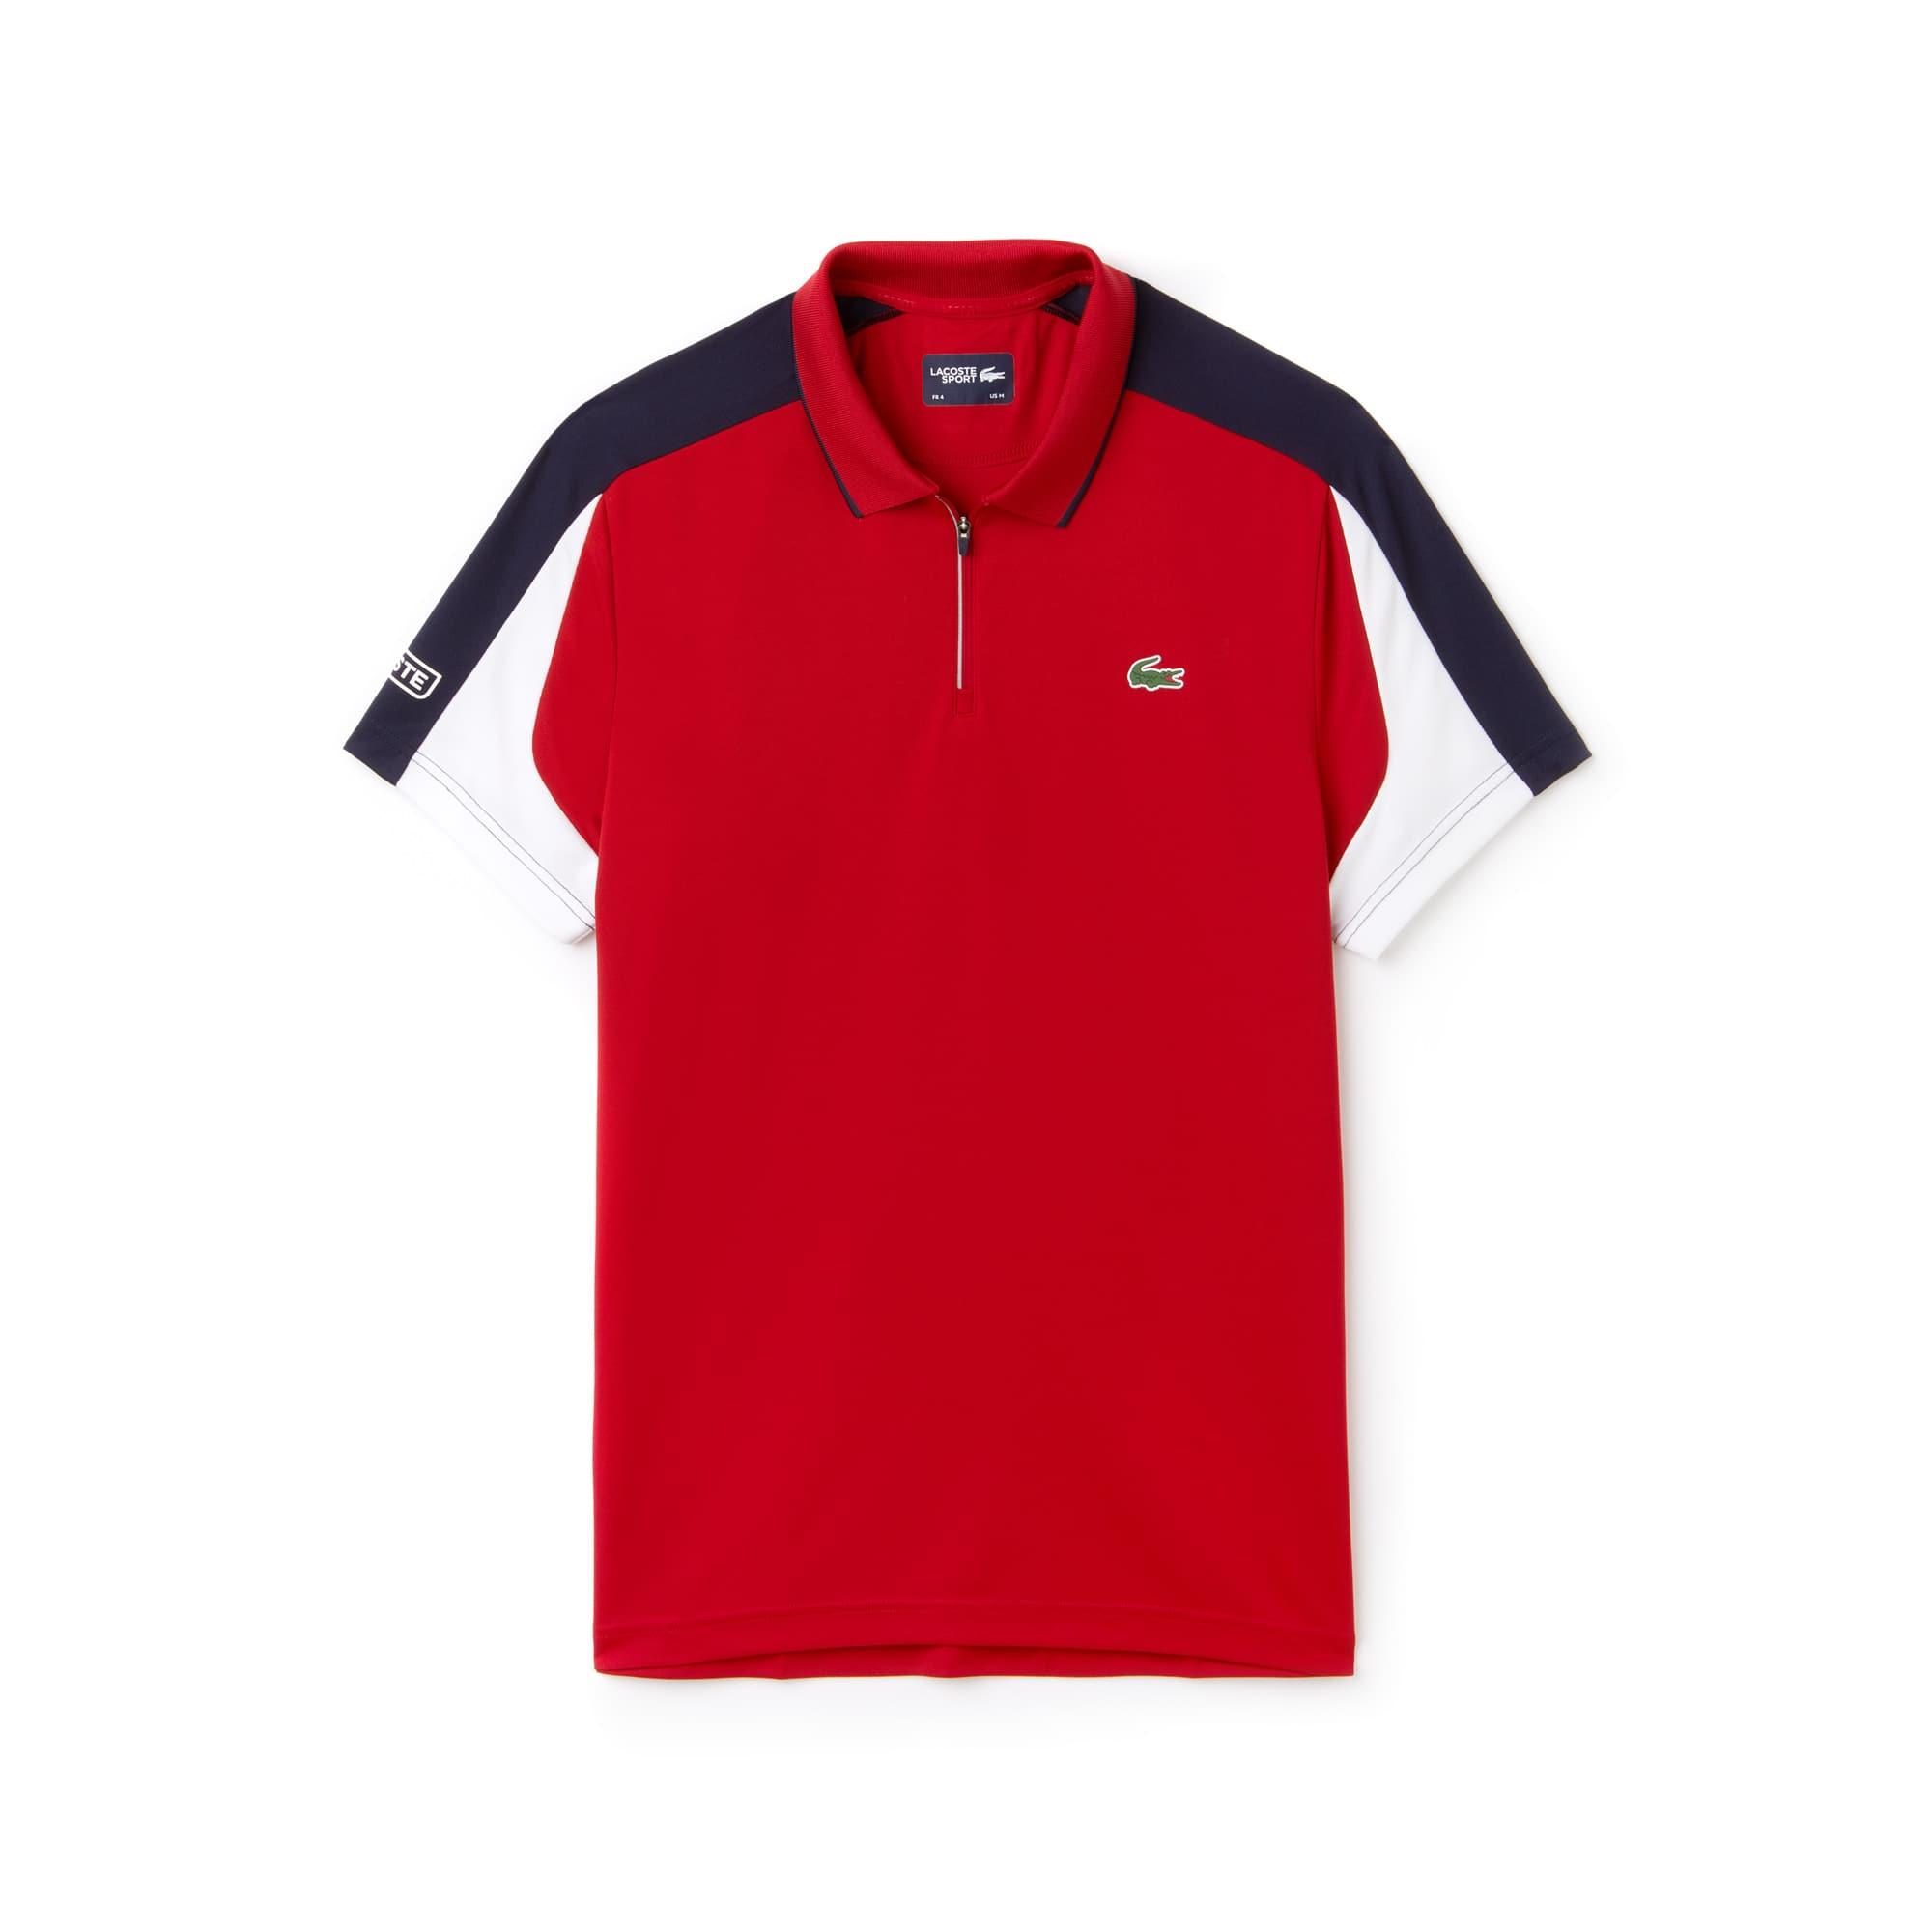 Men's SPORT Zip Neck Contrast Bands Piqué Tennis Polo